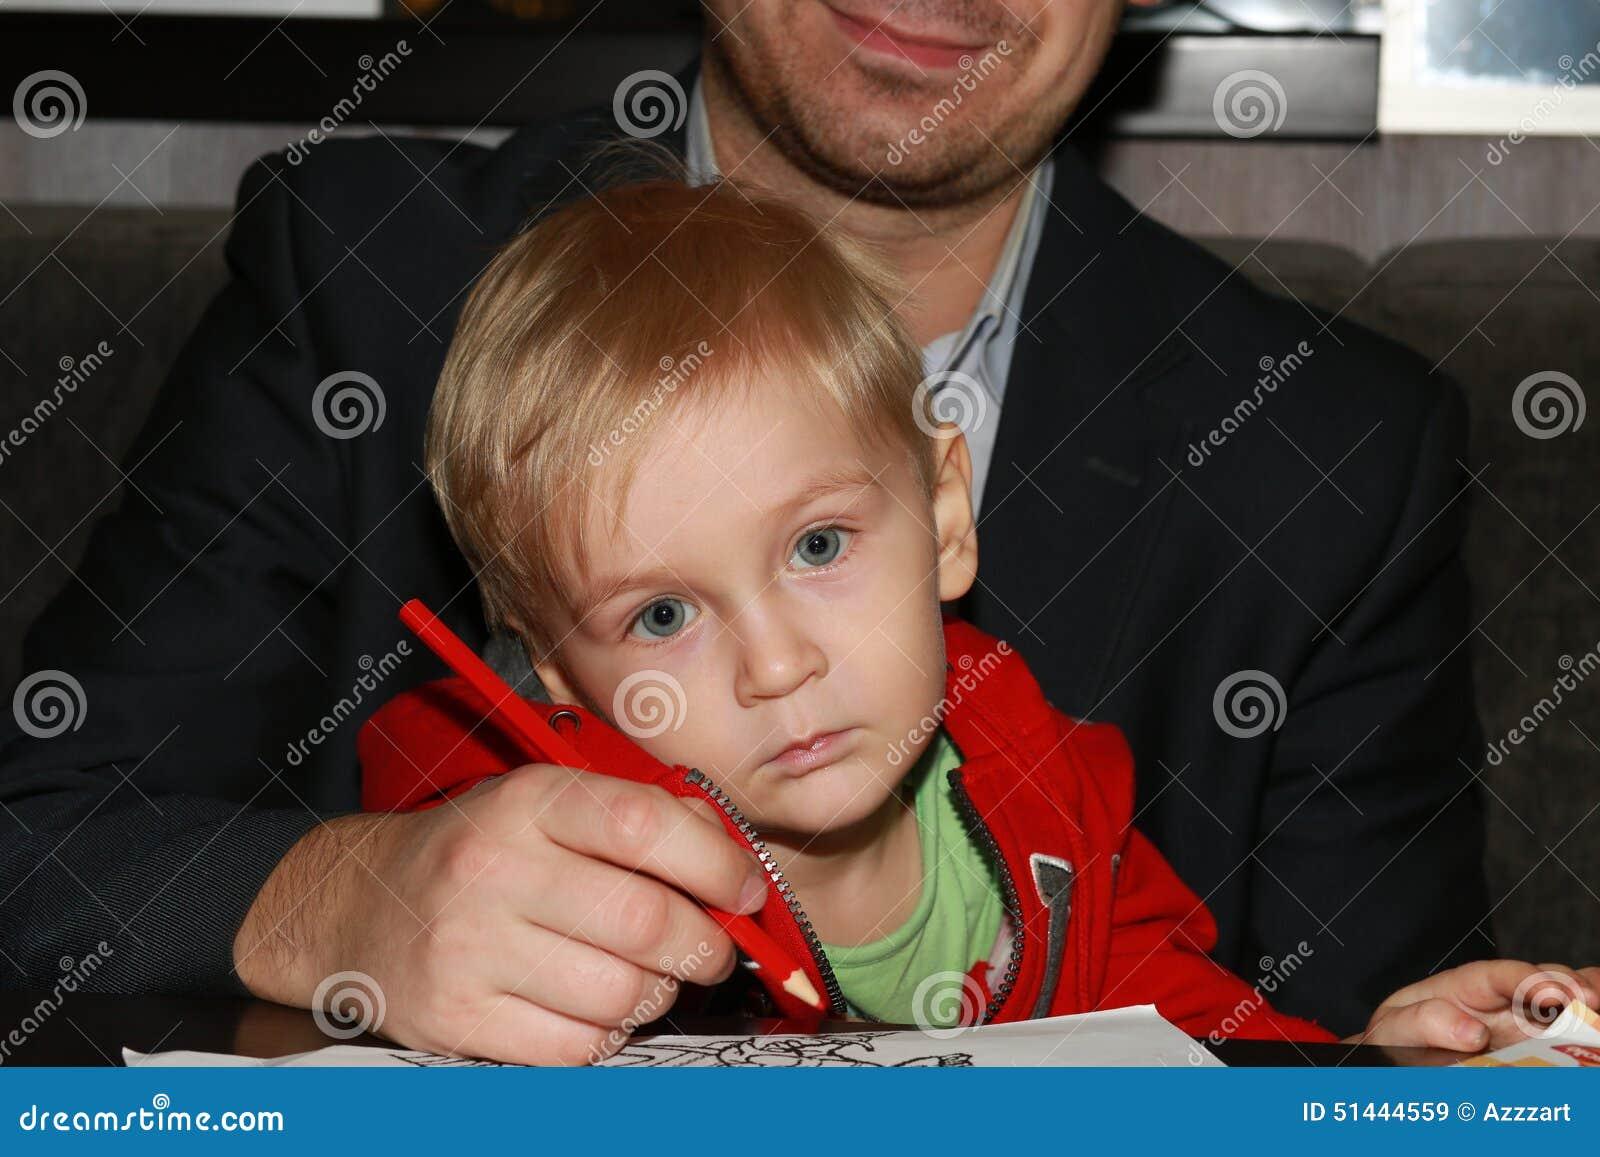 Daddy to small boy gay sex bareback 7